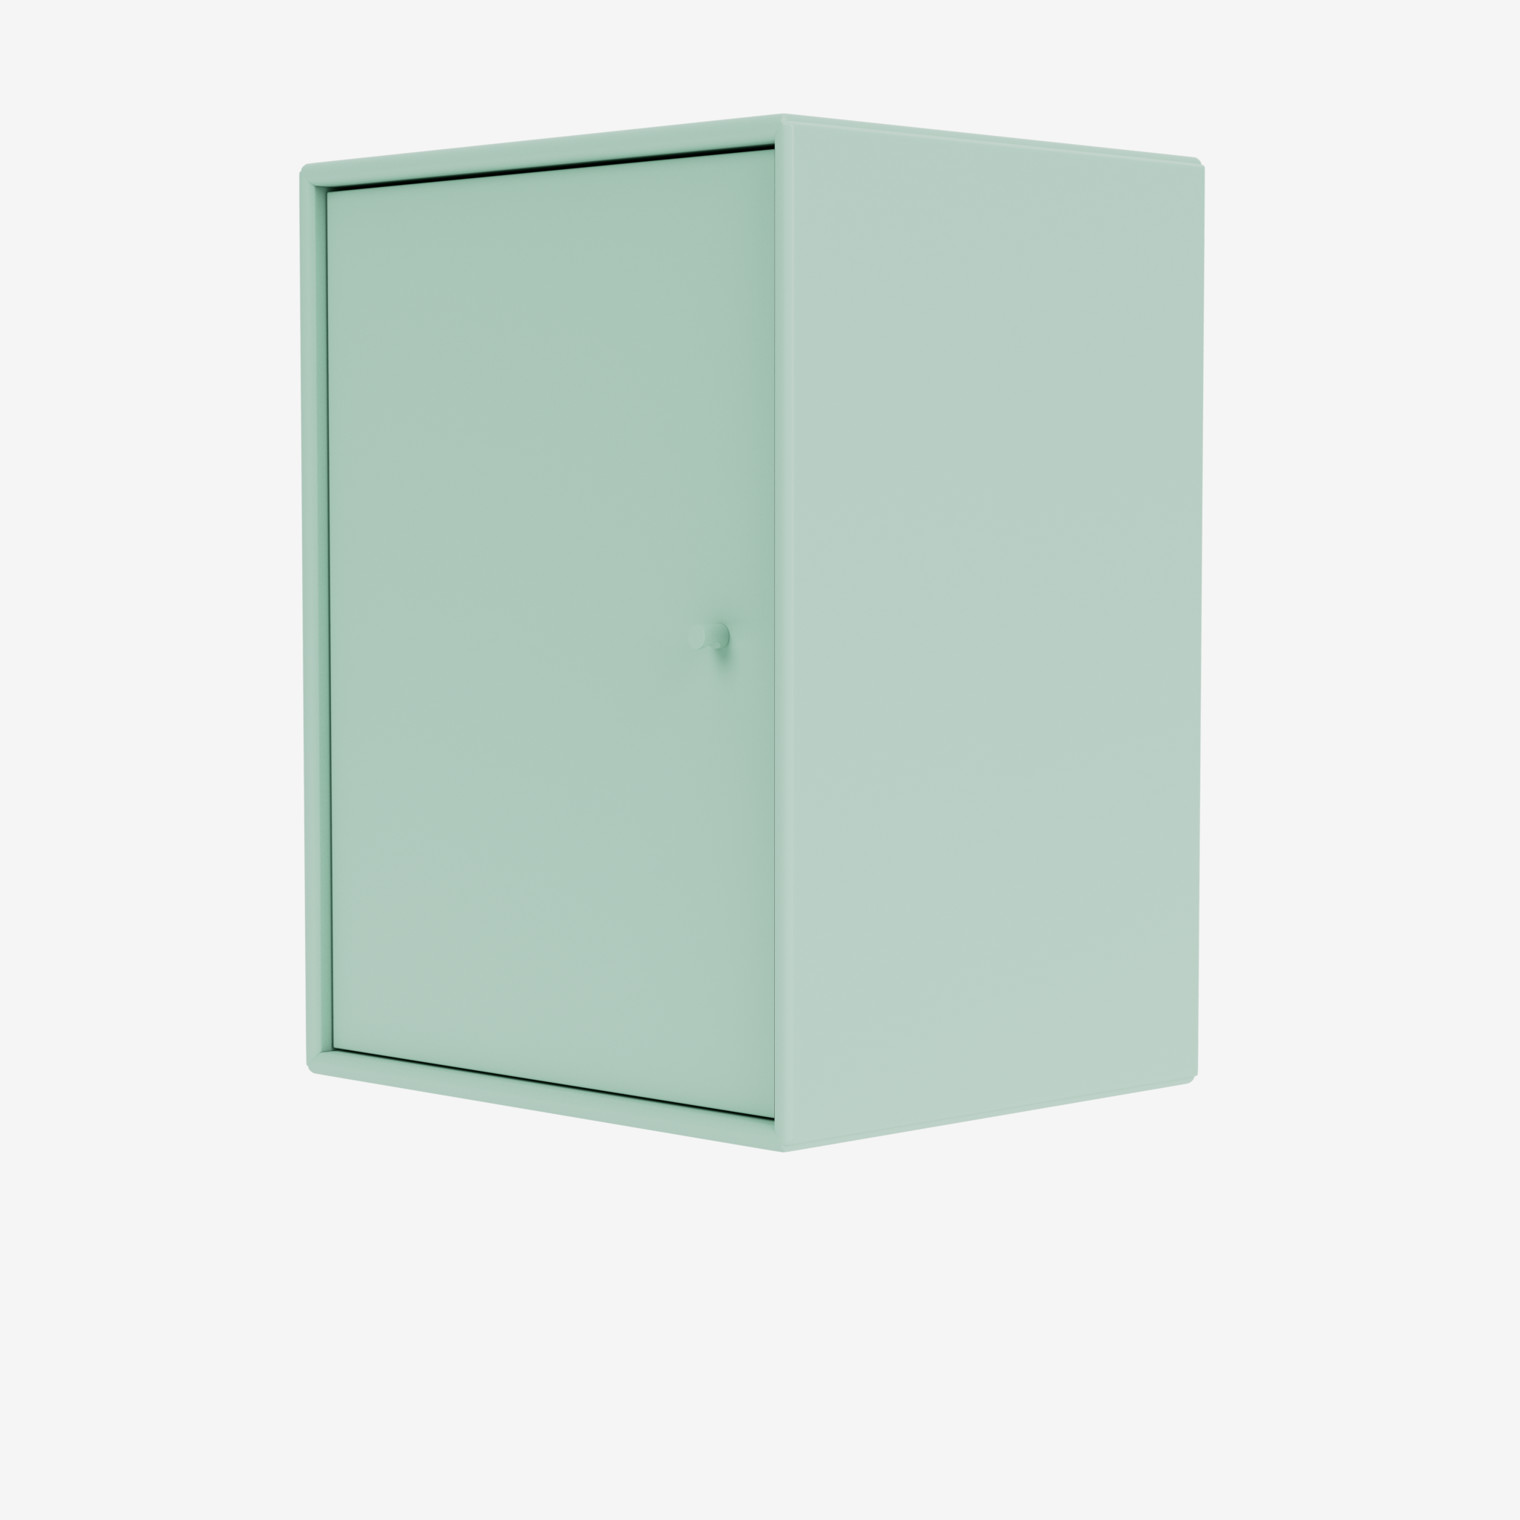 Cabinet 4163